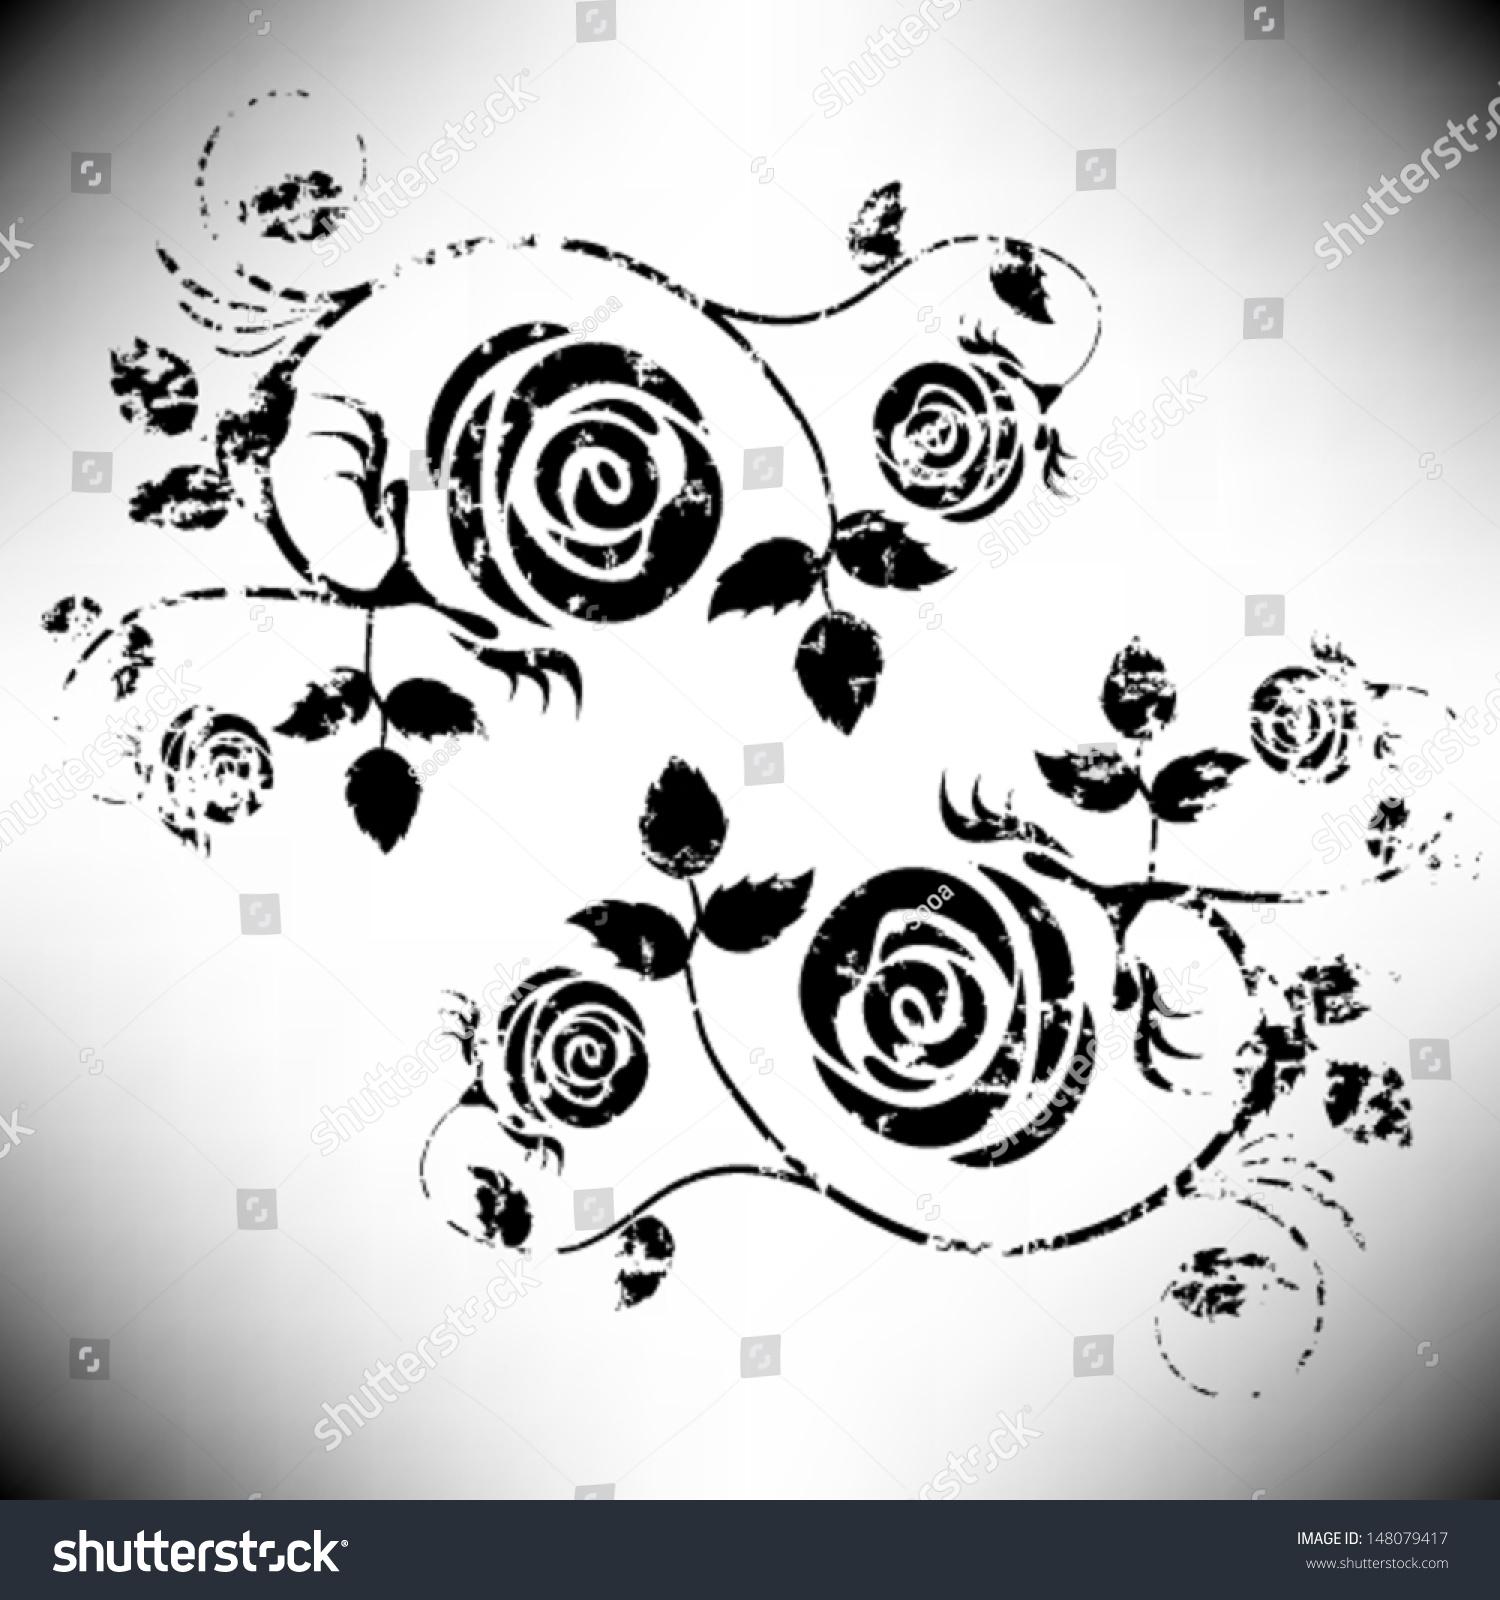 Vintage Grunge Flower Vector Rose Element Stock Vector ...